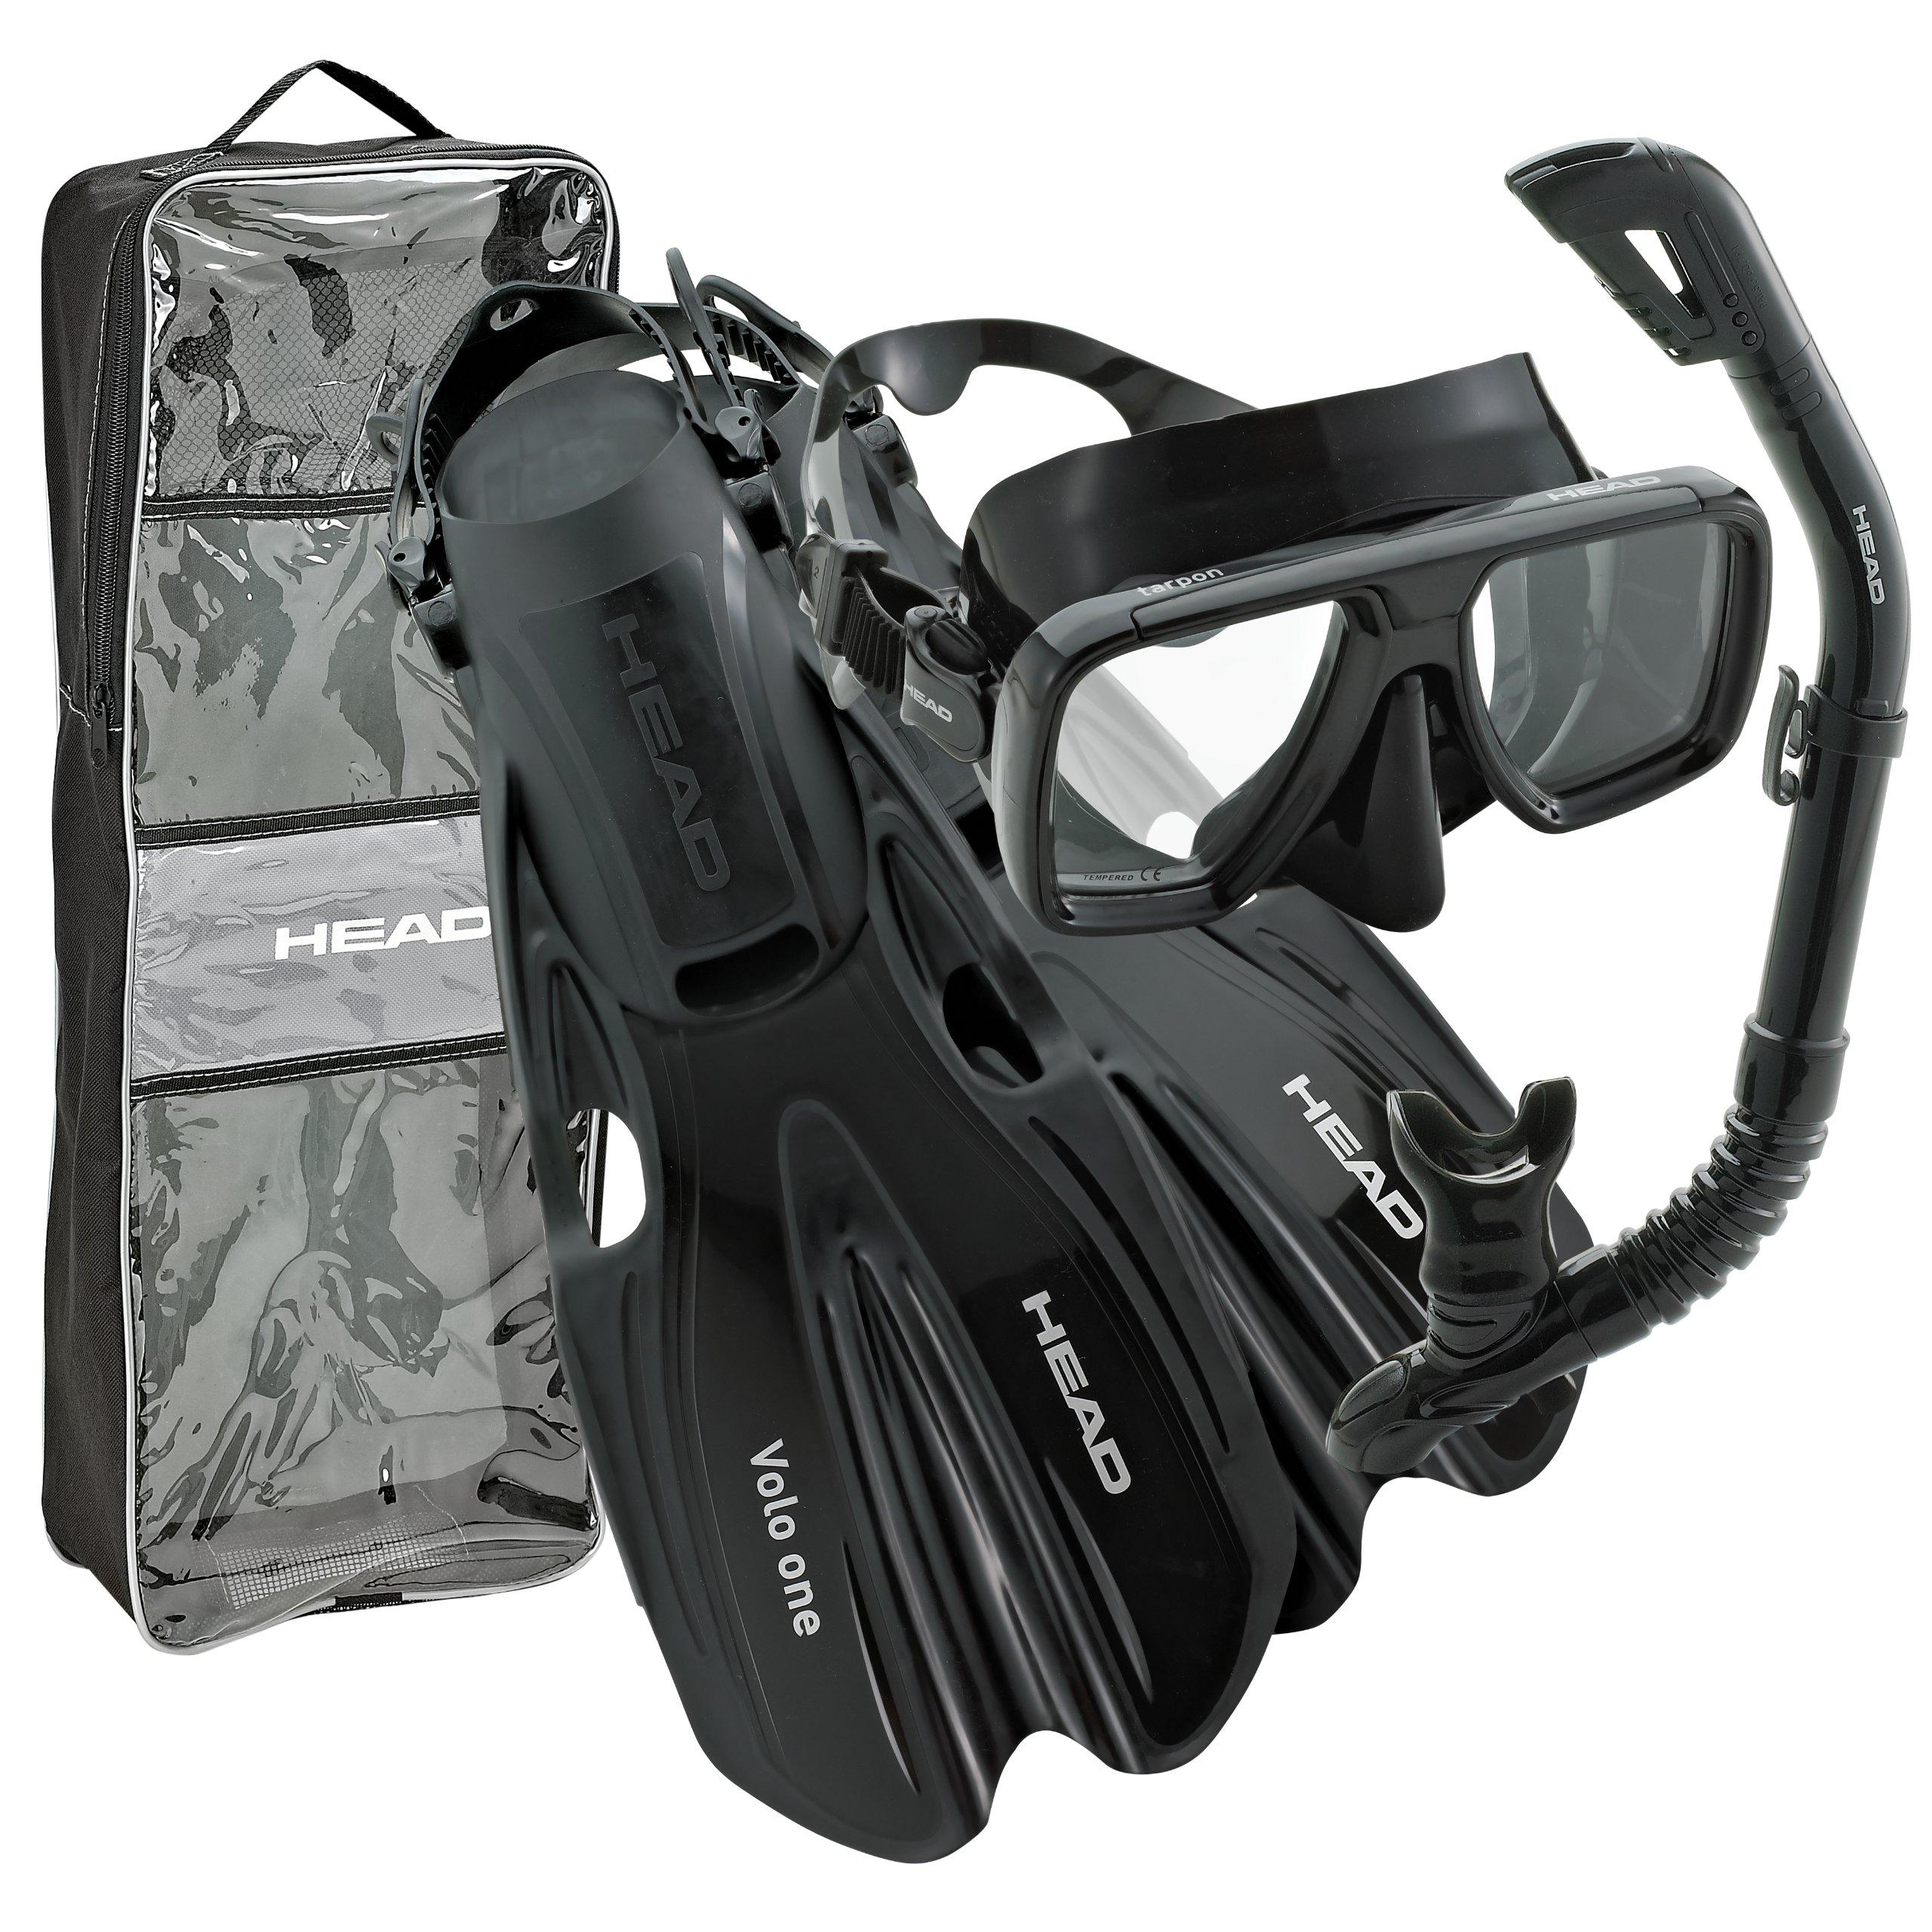 HEAD by Mares Tarpon Travel Friendly Premium Mask Fin Snorkel Set, Black, Large, (10-13) by HEAD